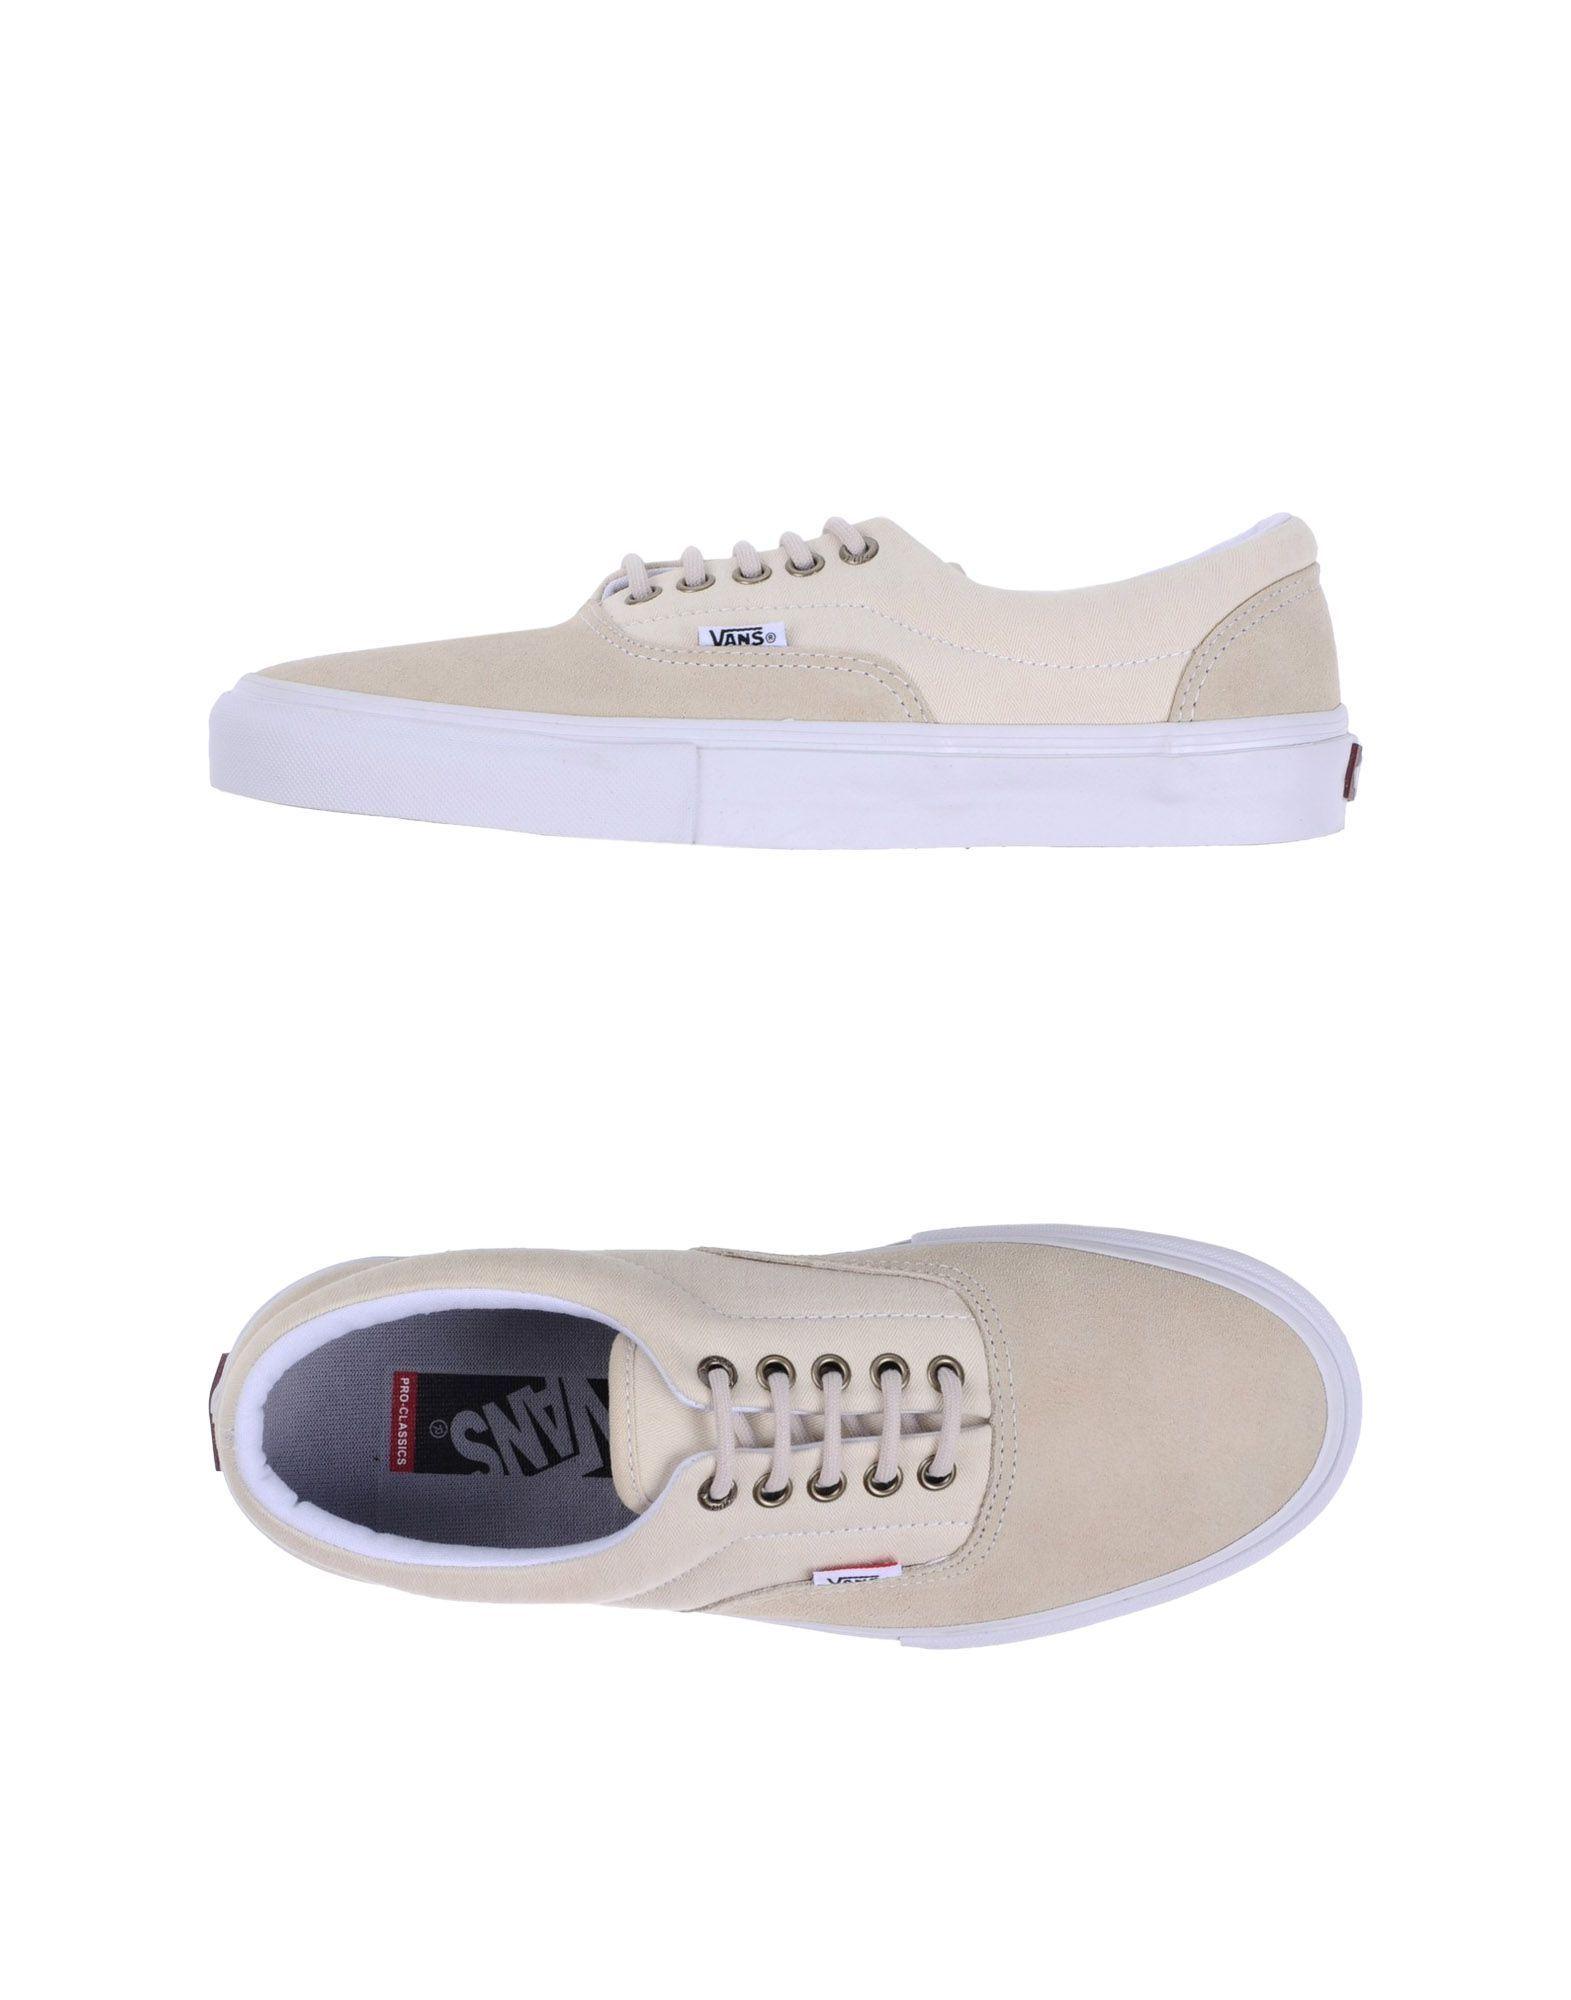 Sneakers & tennis shoes basse Vans Uomo - Acquista online su YOOX